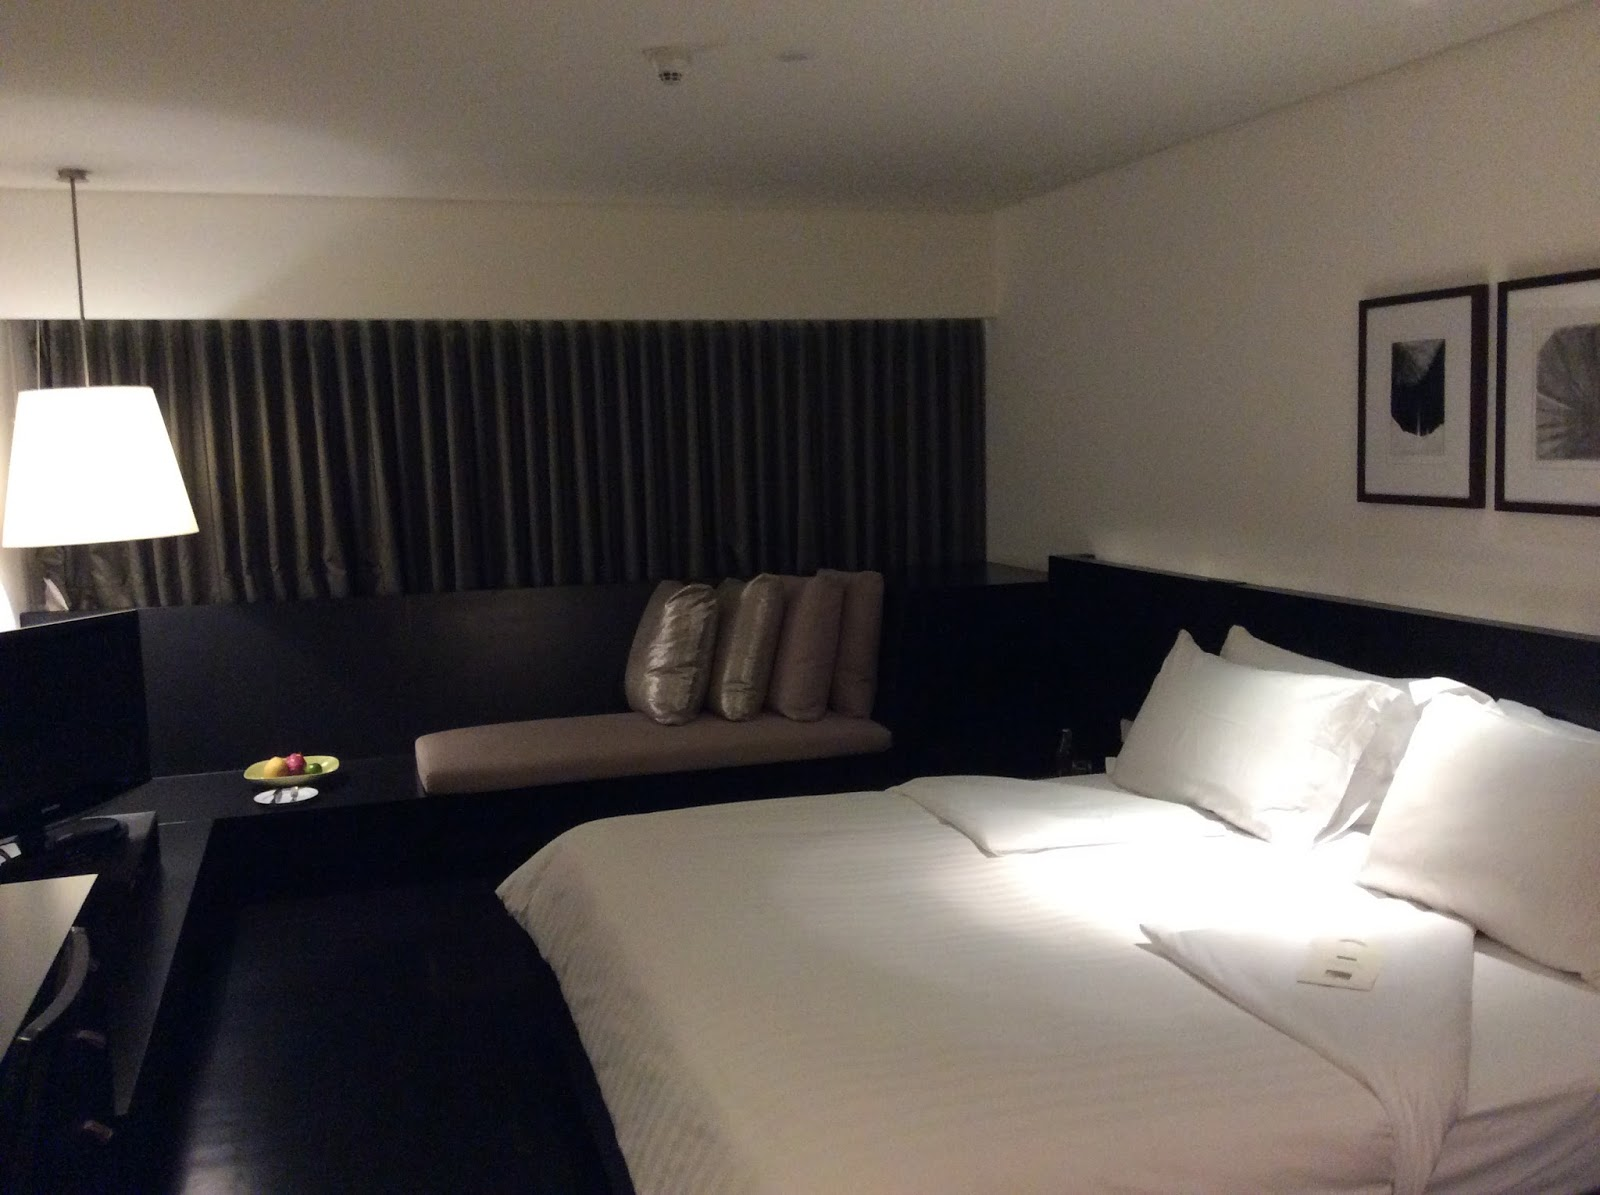 bangkok pour les nuls ao t 2016. Black Bedroom Furniture Sets. Home Design Ideas